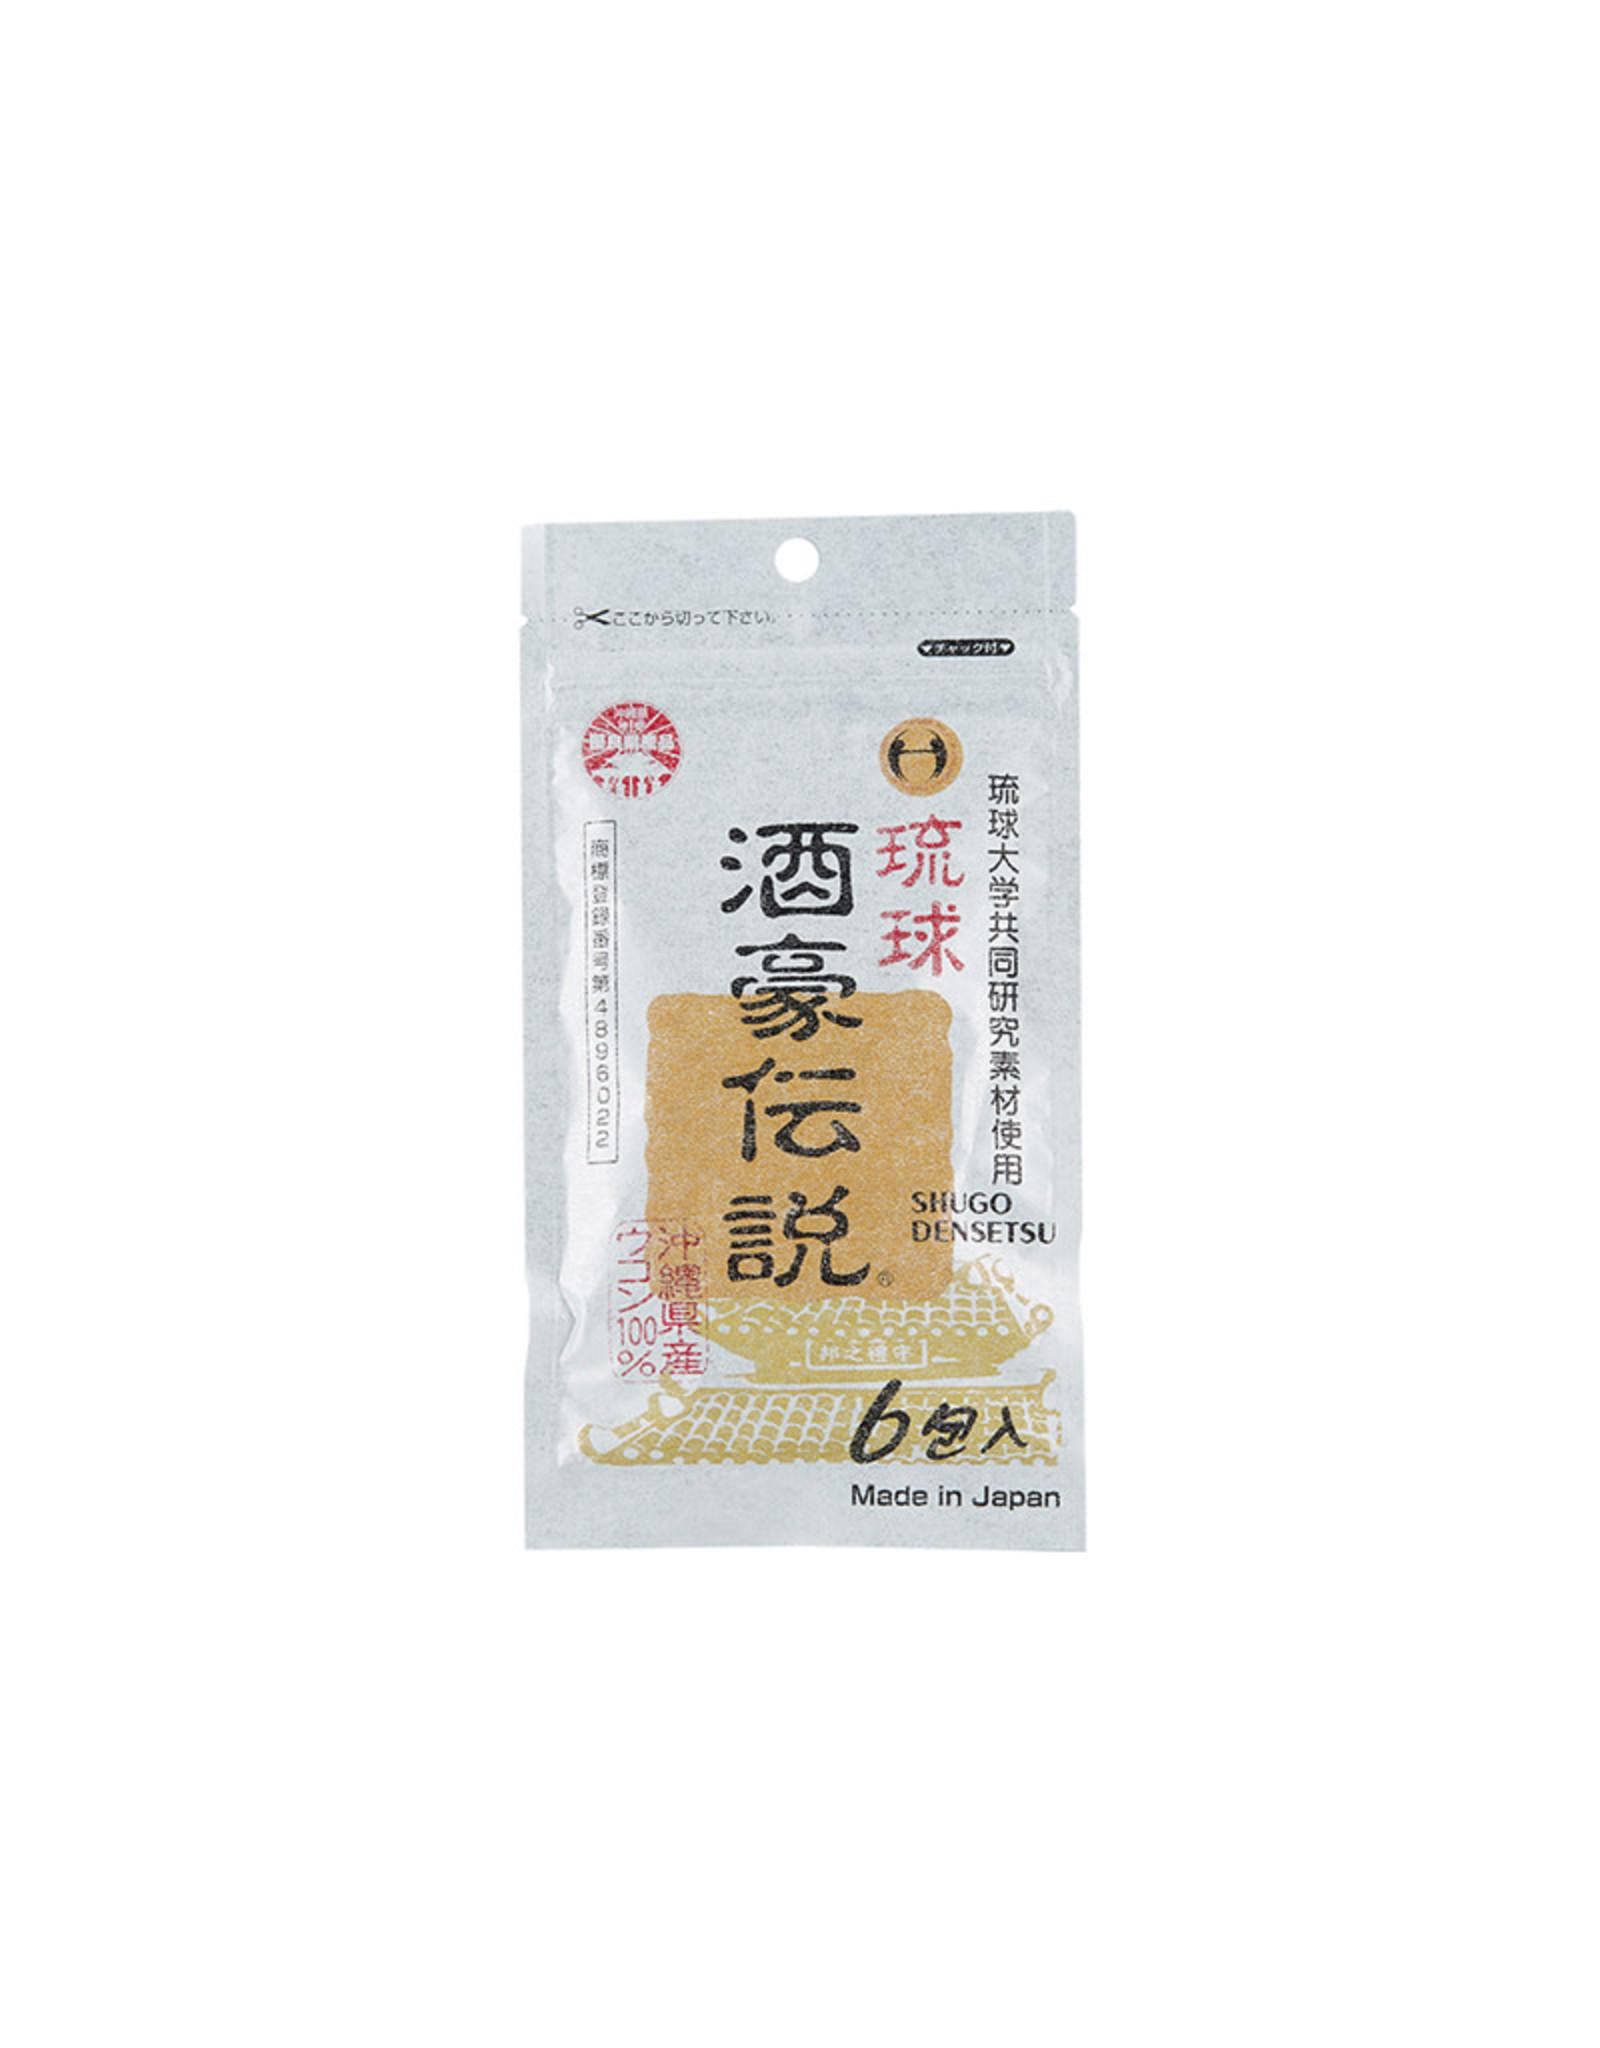 Shugo Densetsu Turmeric Tablet 6 Packs